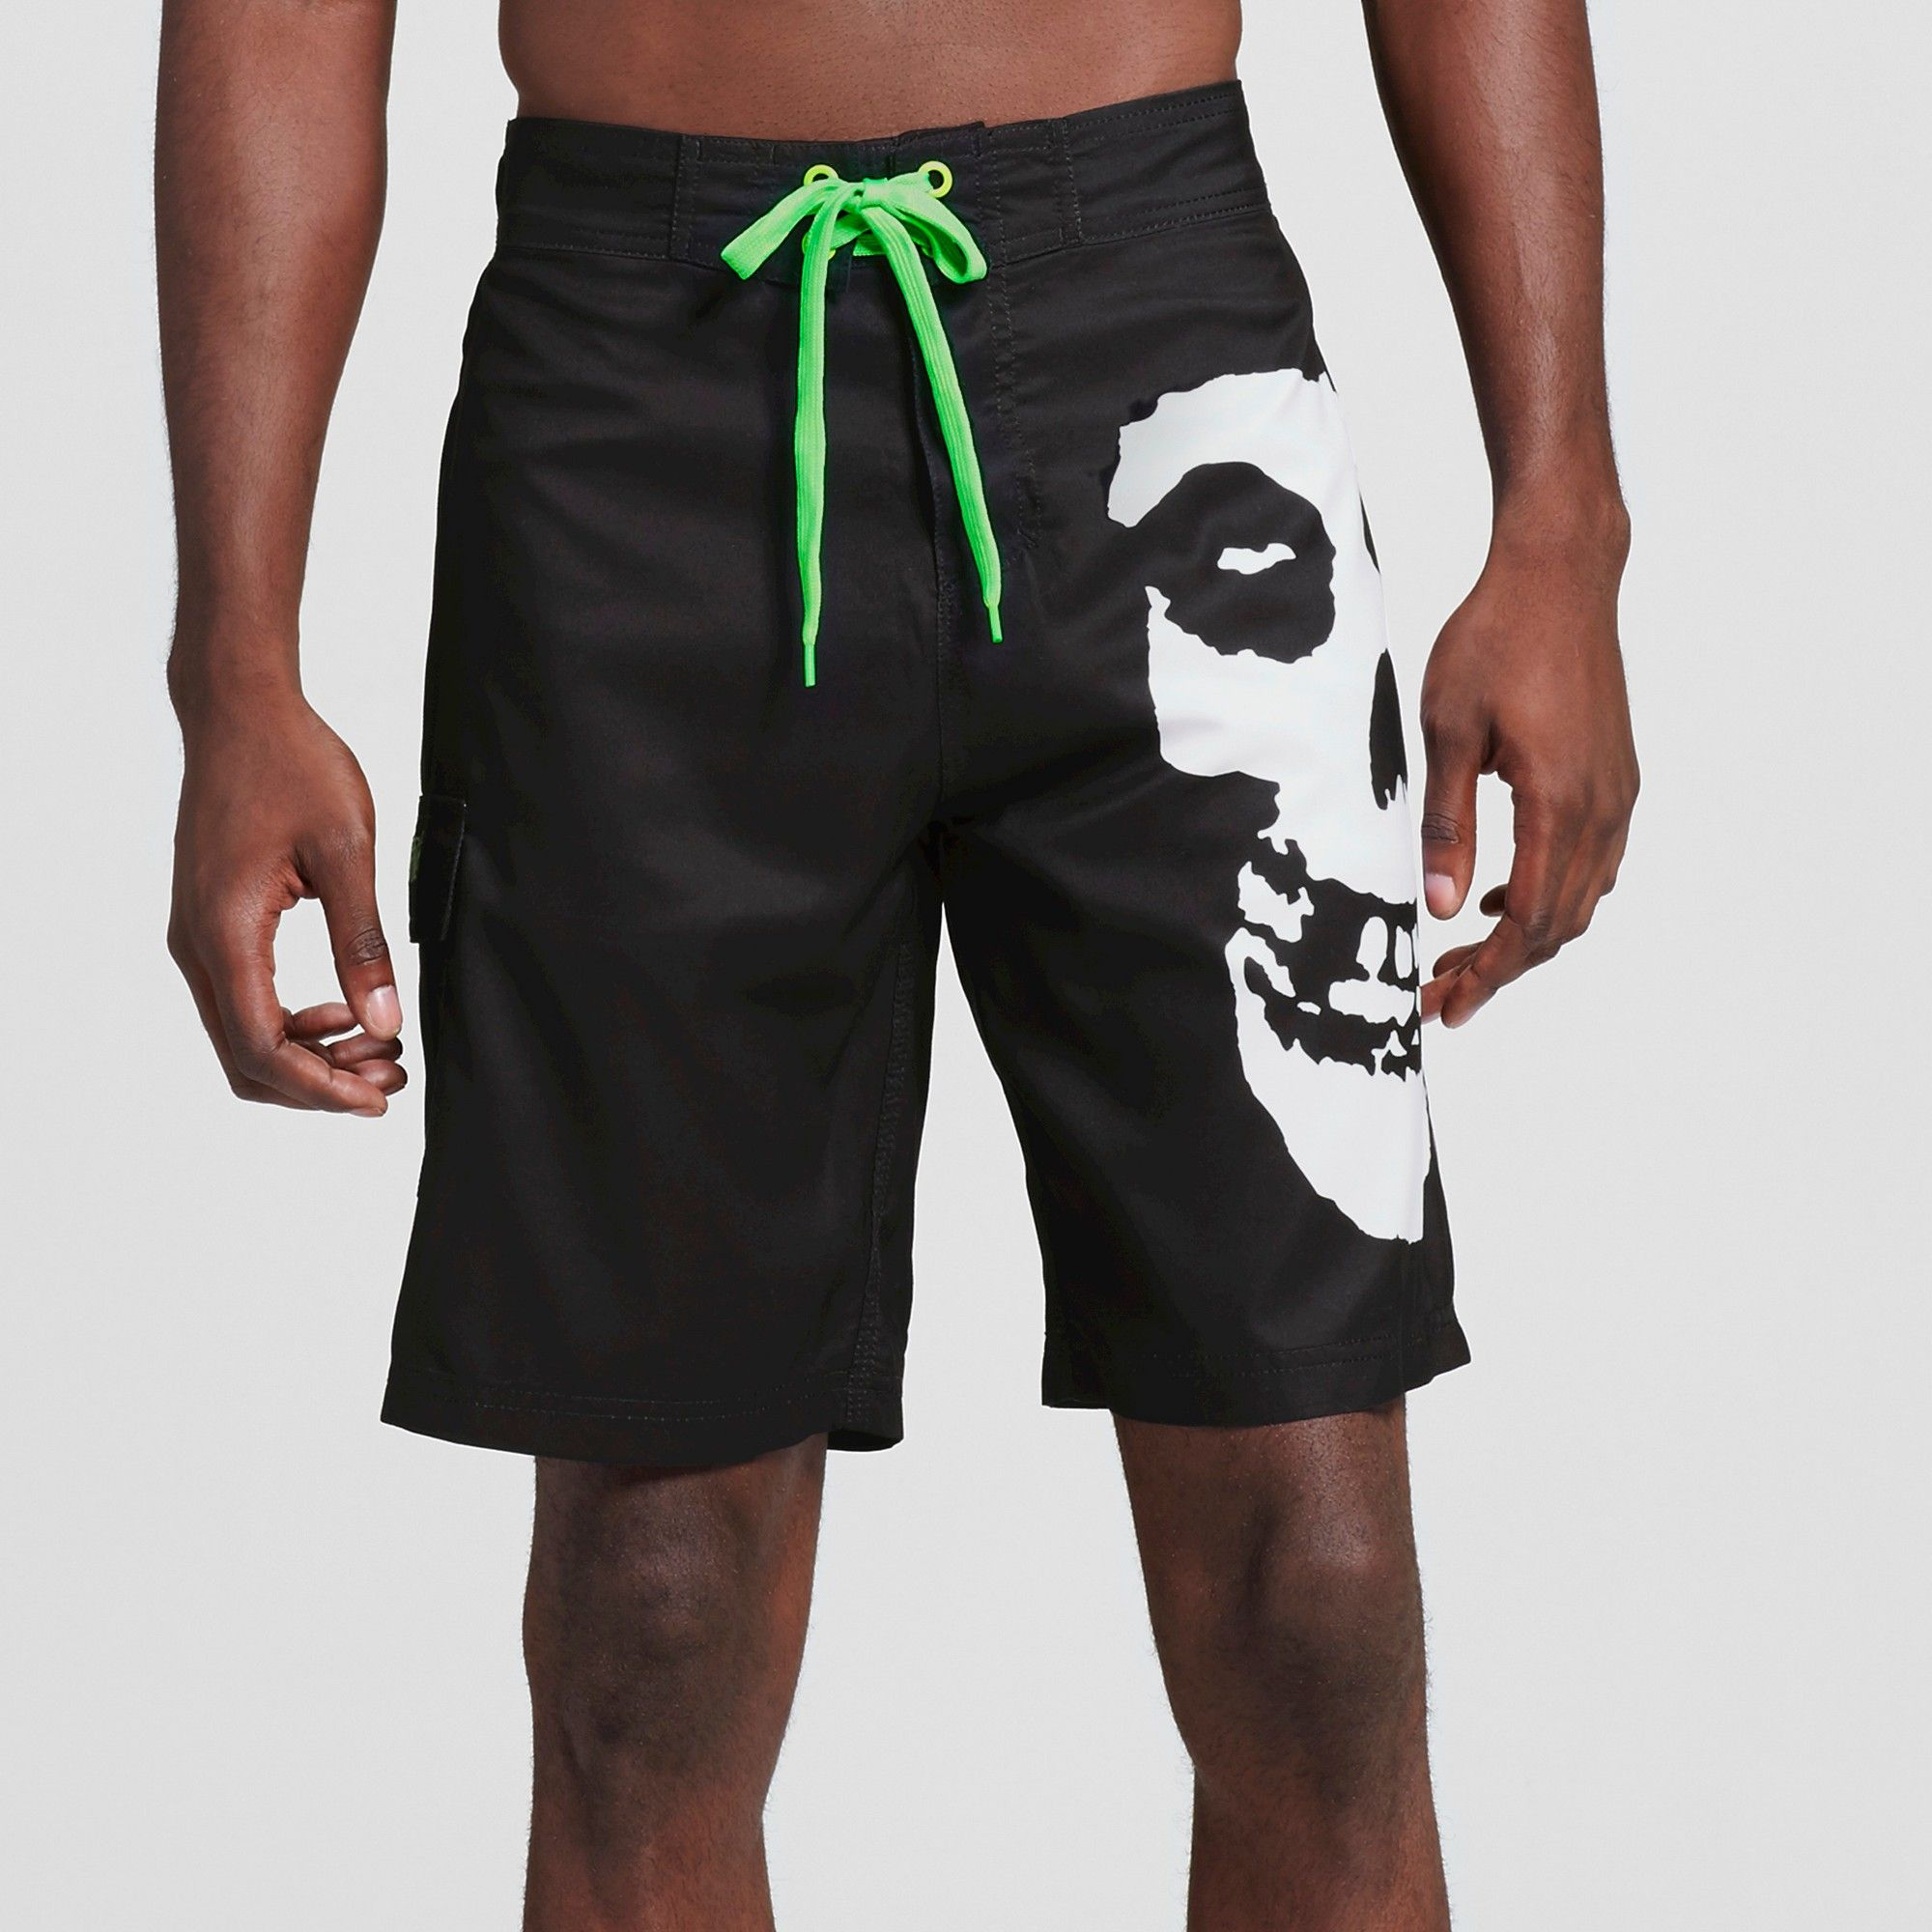 e5e06dfcac Men's Misfits Logo Board Shorts Black/White S - Misfits | Products ...